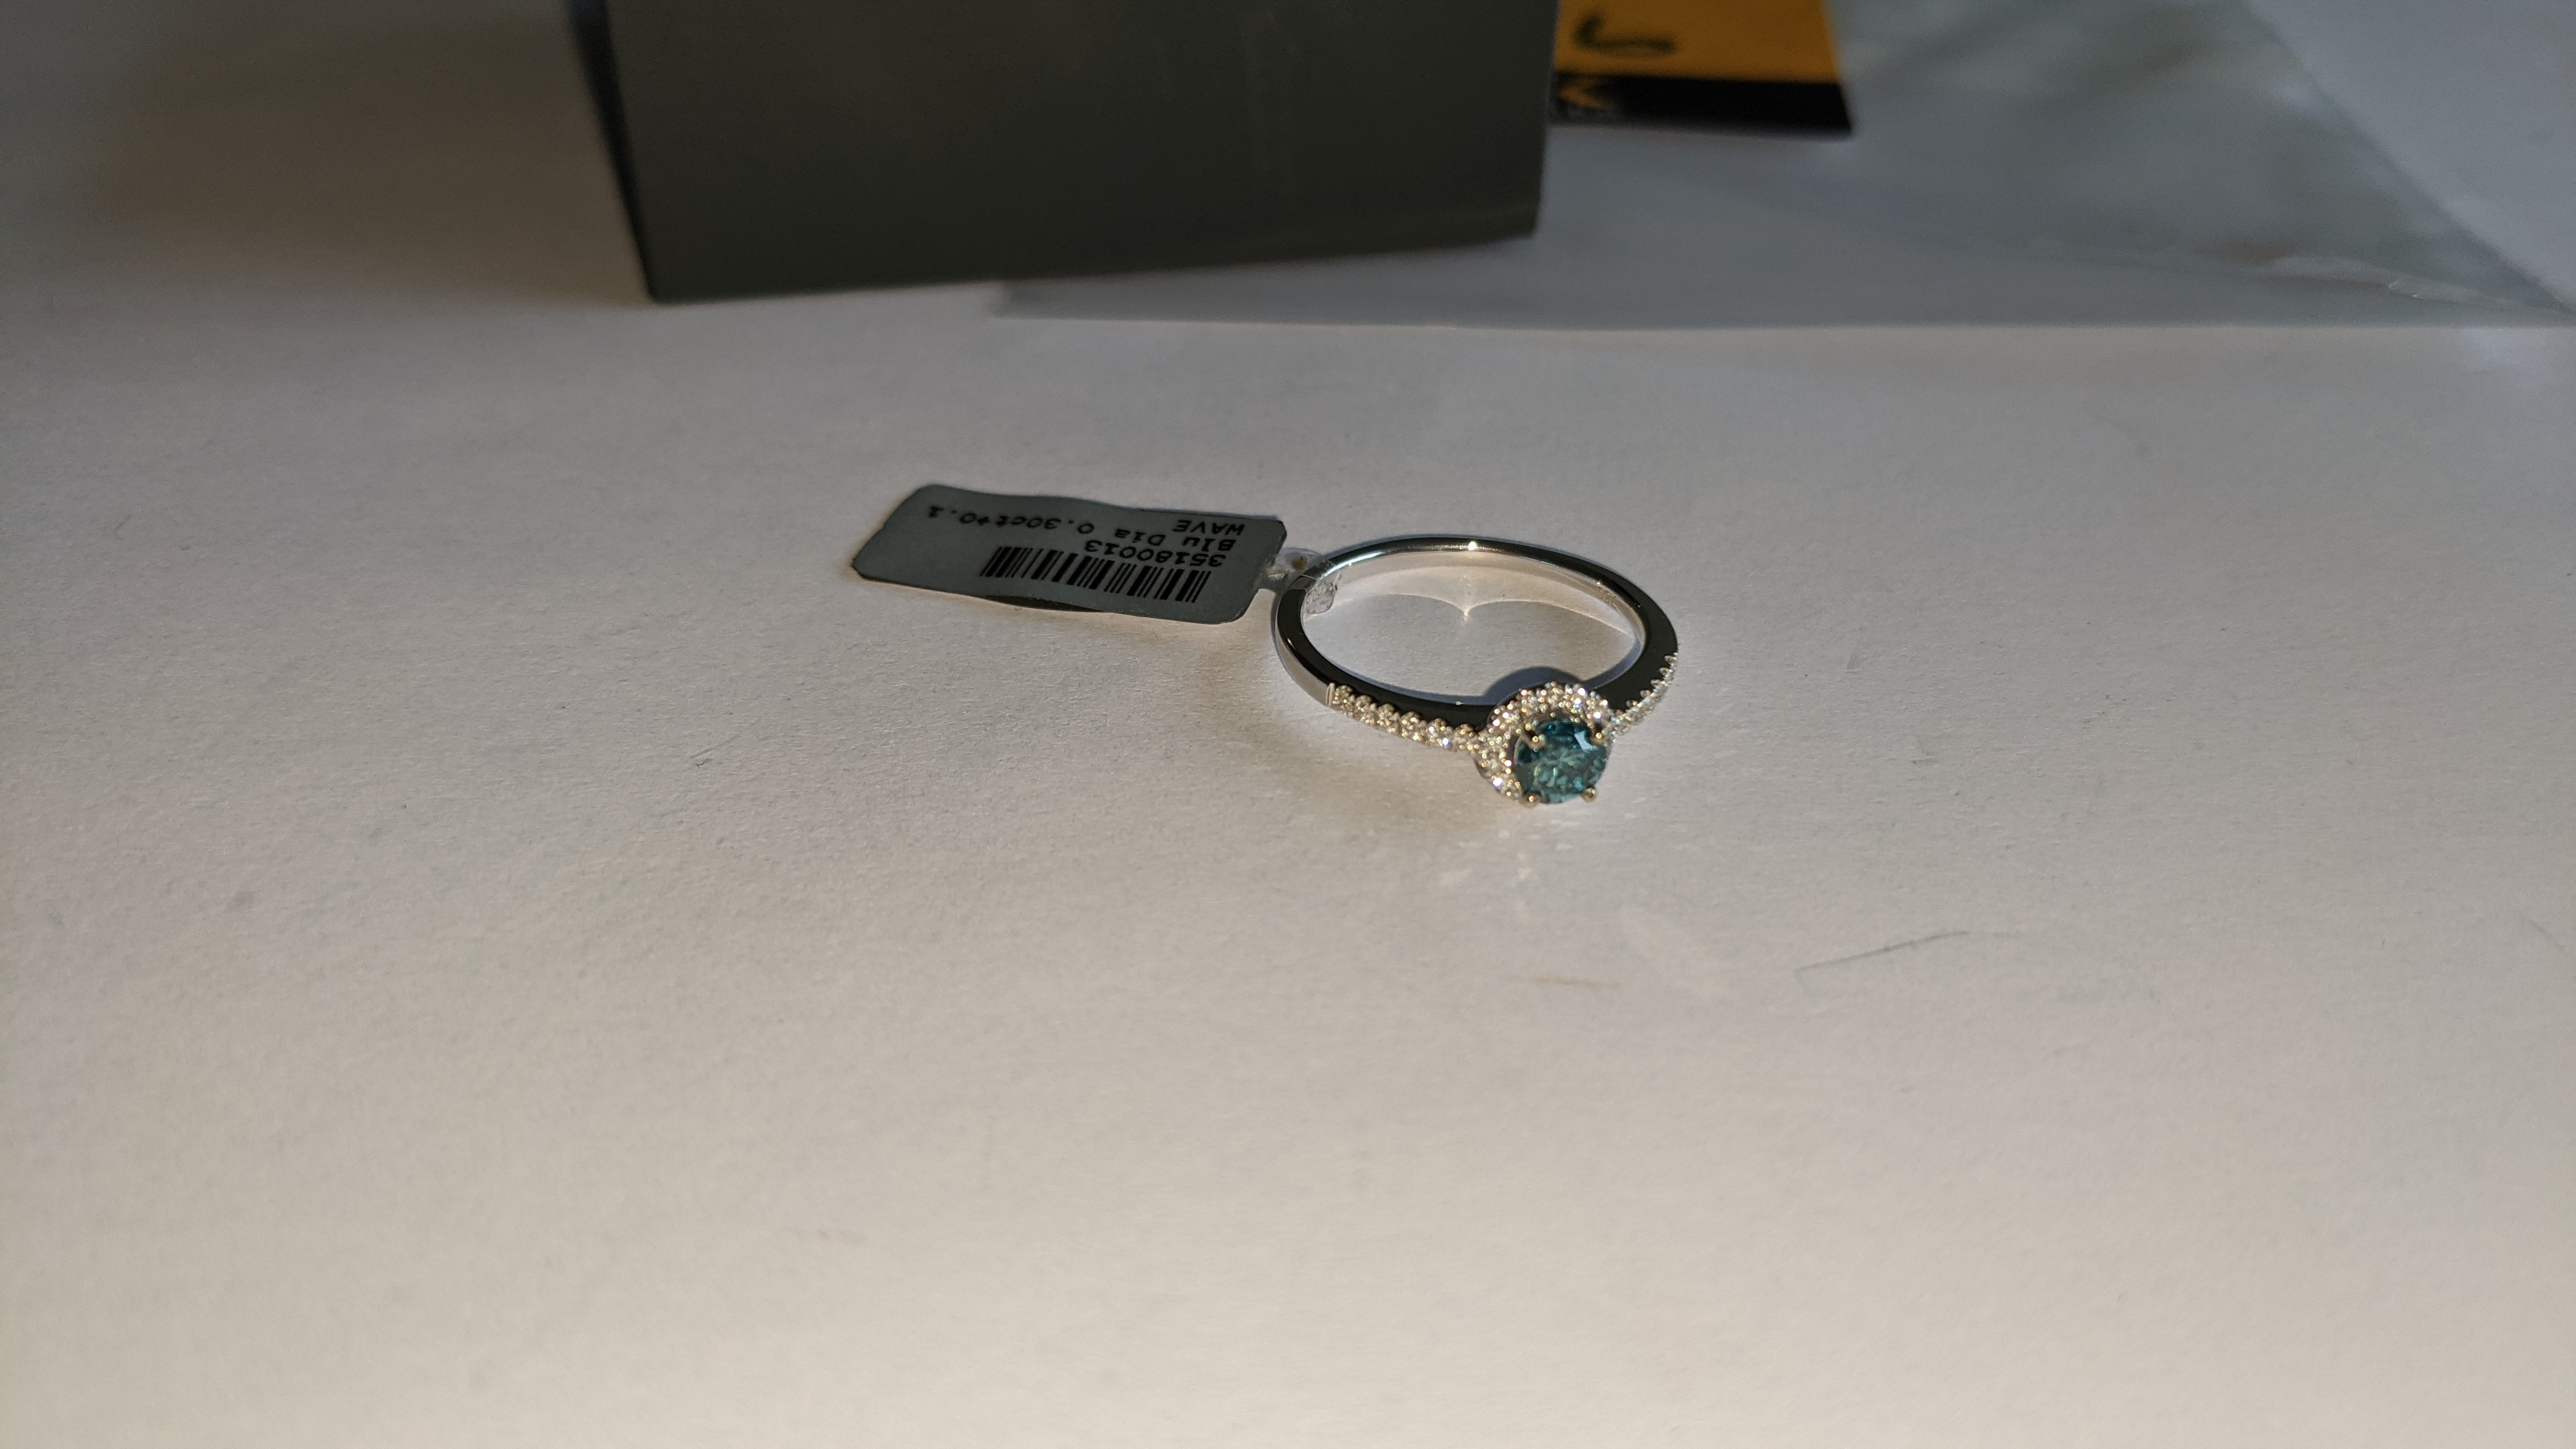 18ct white gold & diamond ring with 0.30ct blue diamond & 0.1ct of additional diamonds around the ce - Image 8 of 19